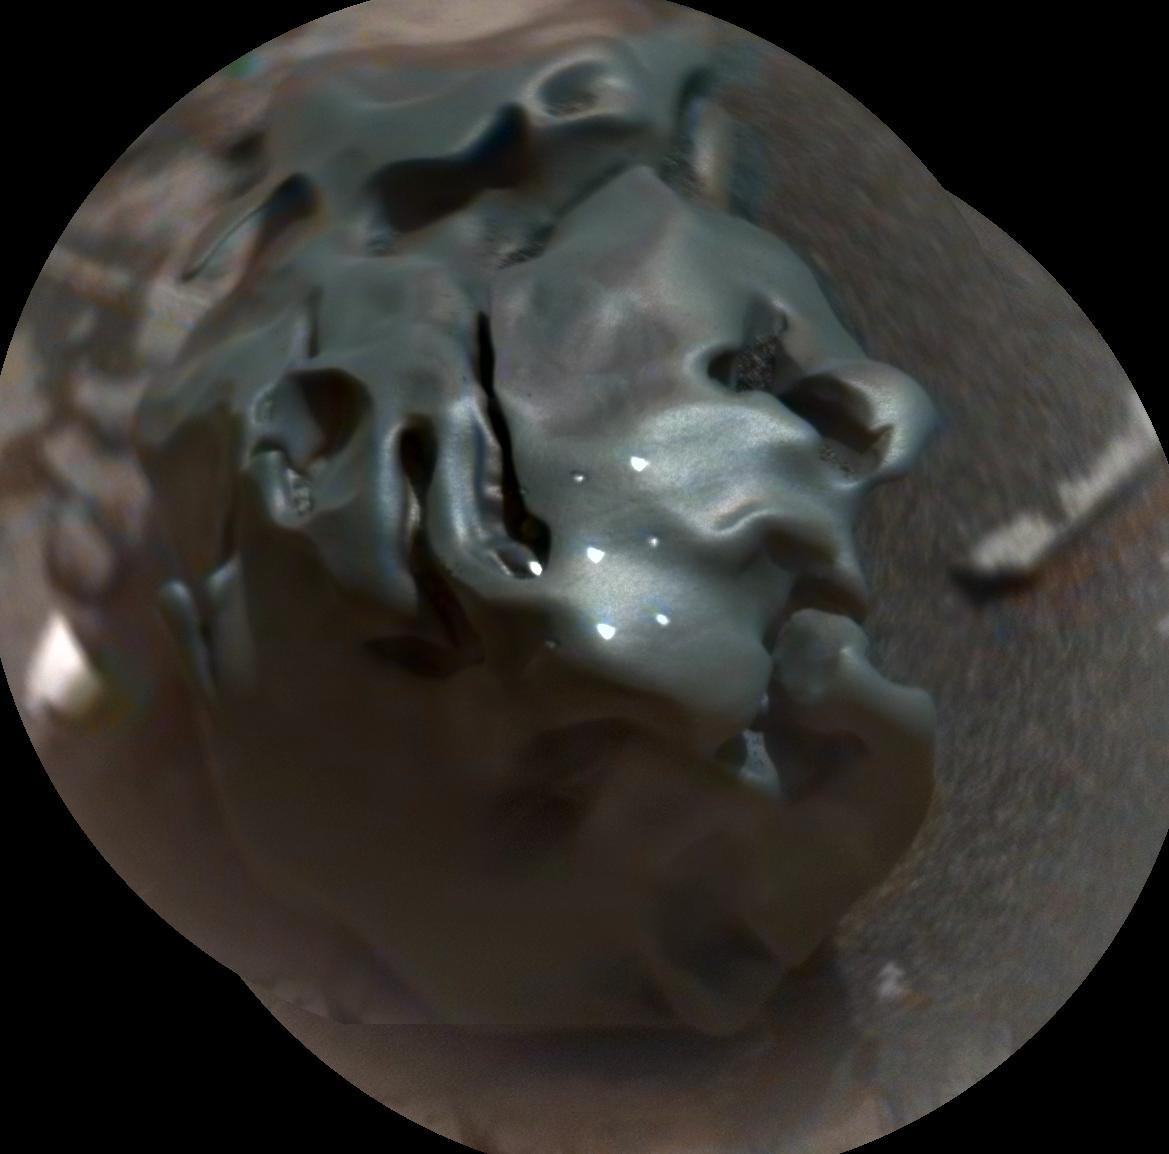 Curiosity Rover Finds Weird 'Egg Rock' Meteorite on Mars